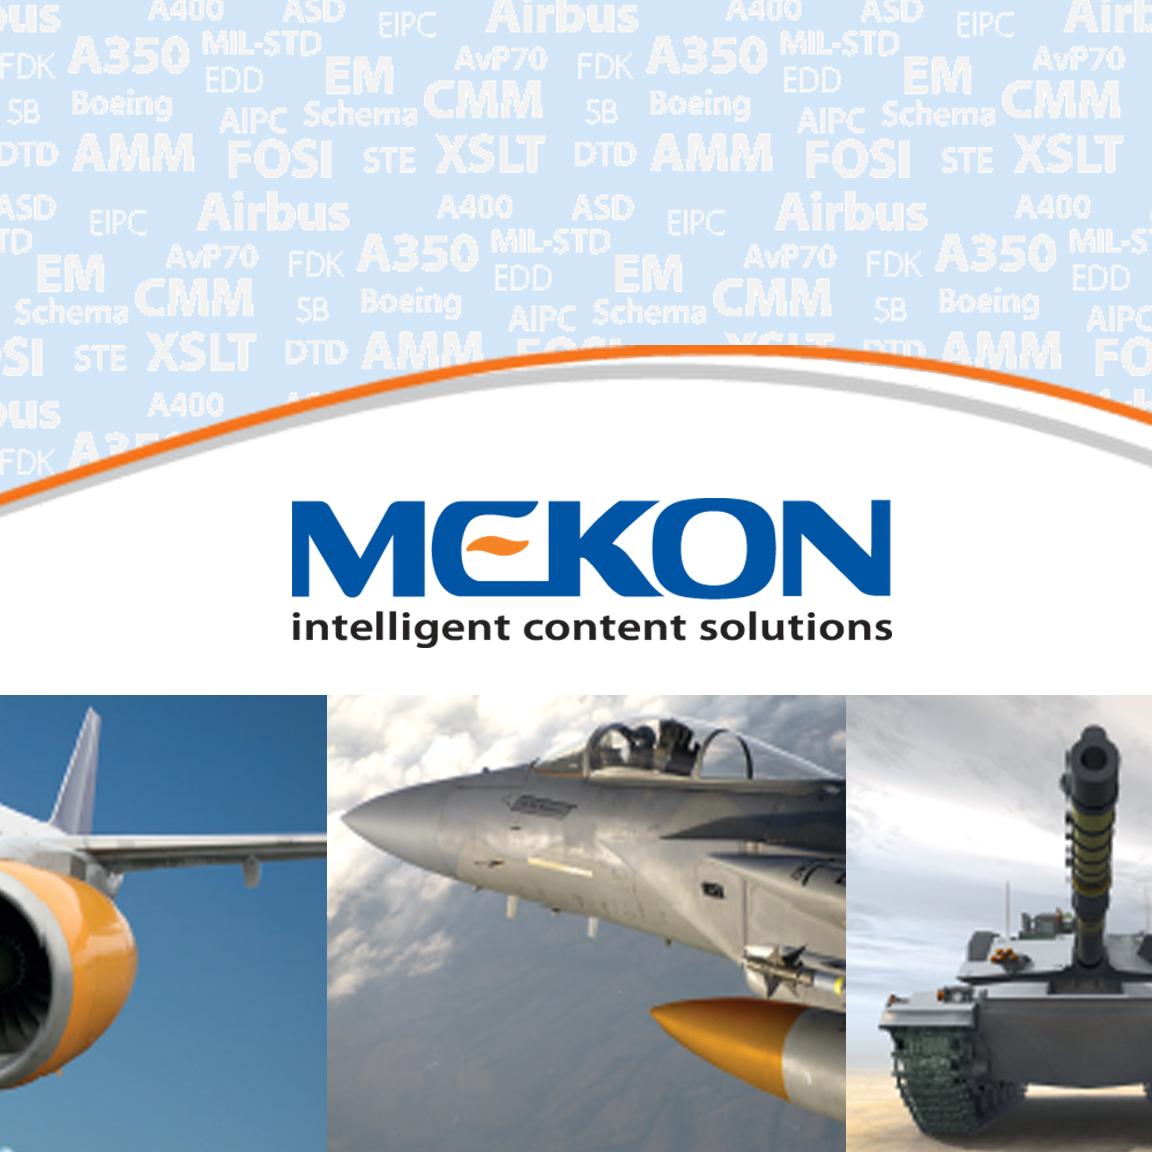 Mekon aerospace and defence